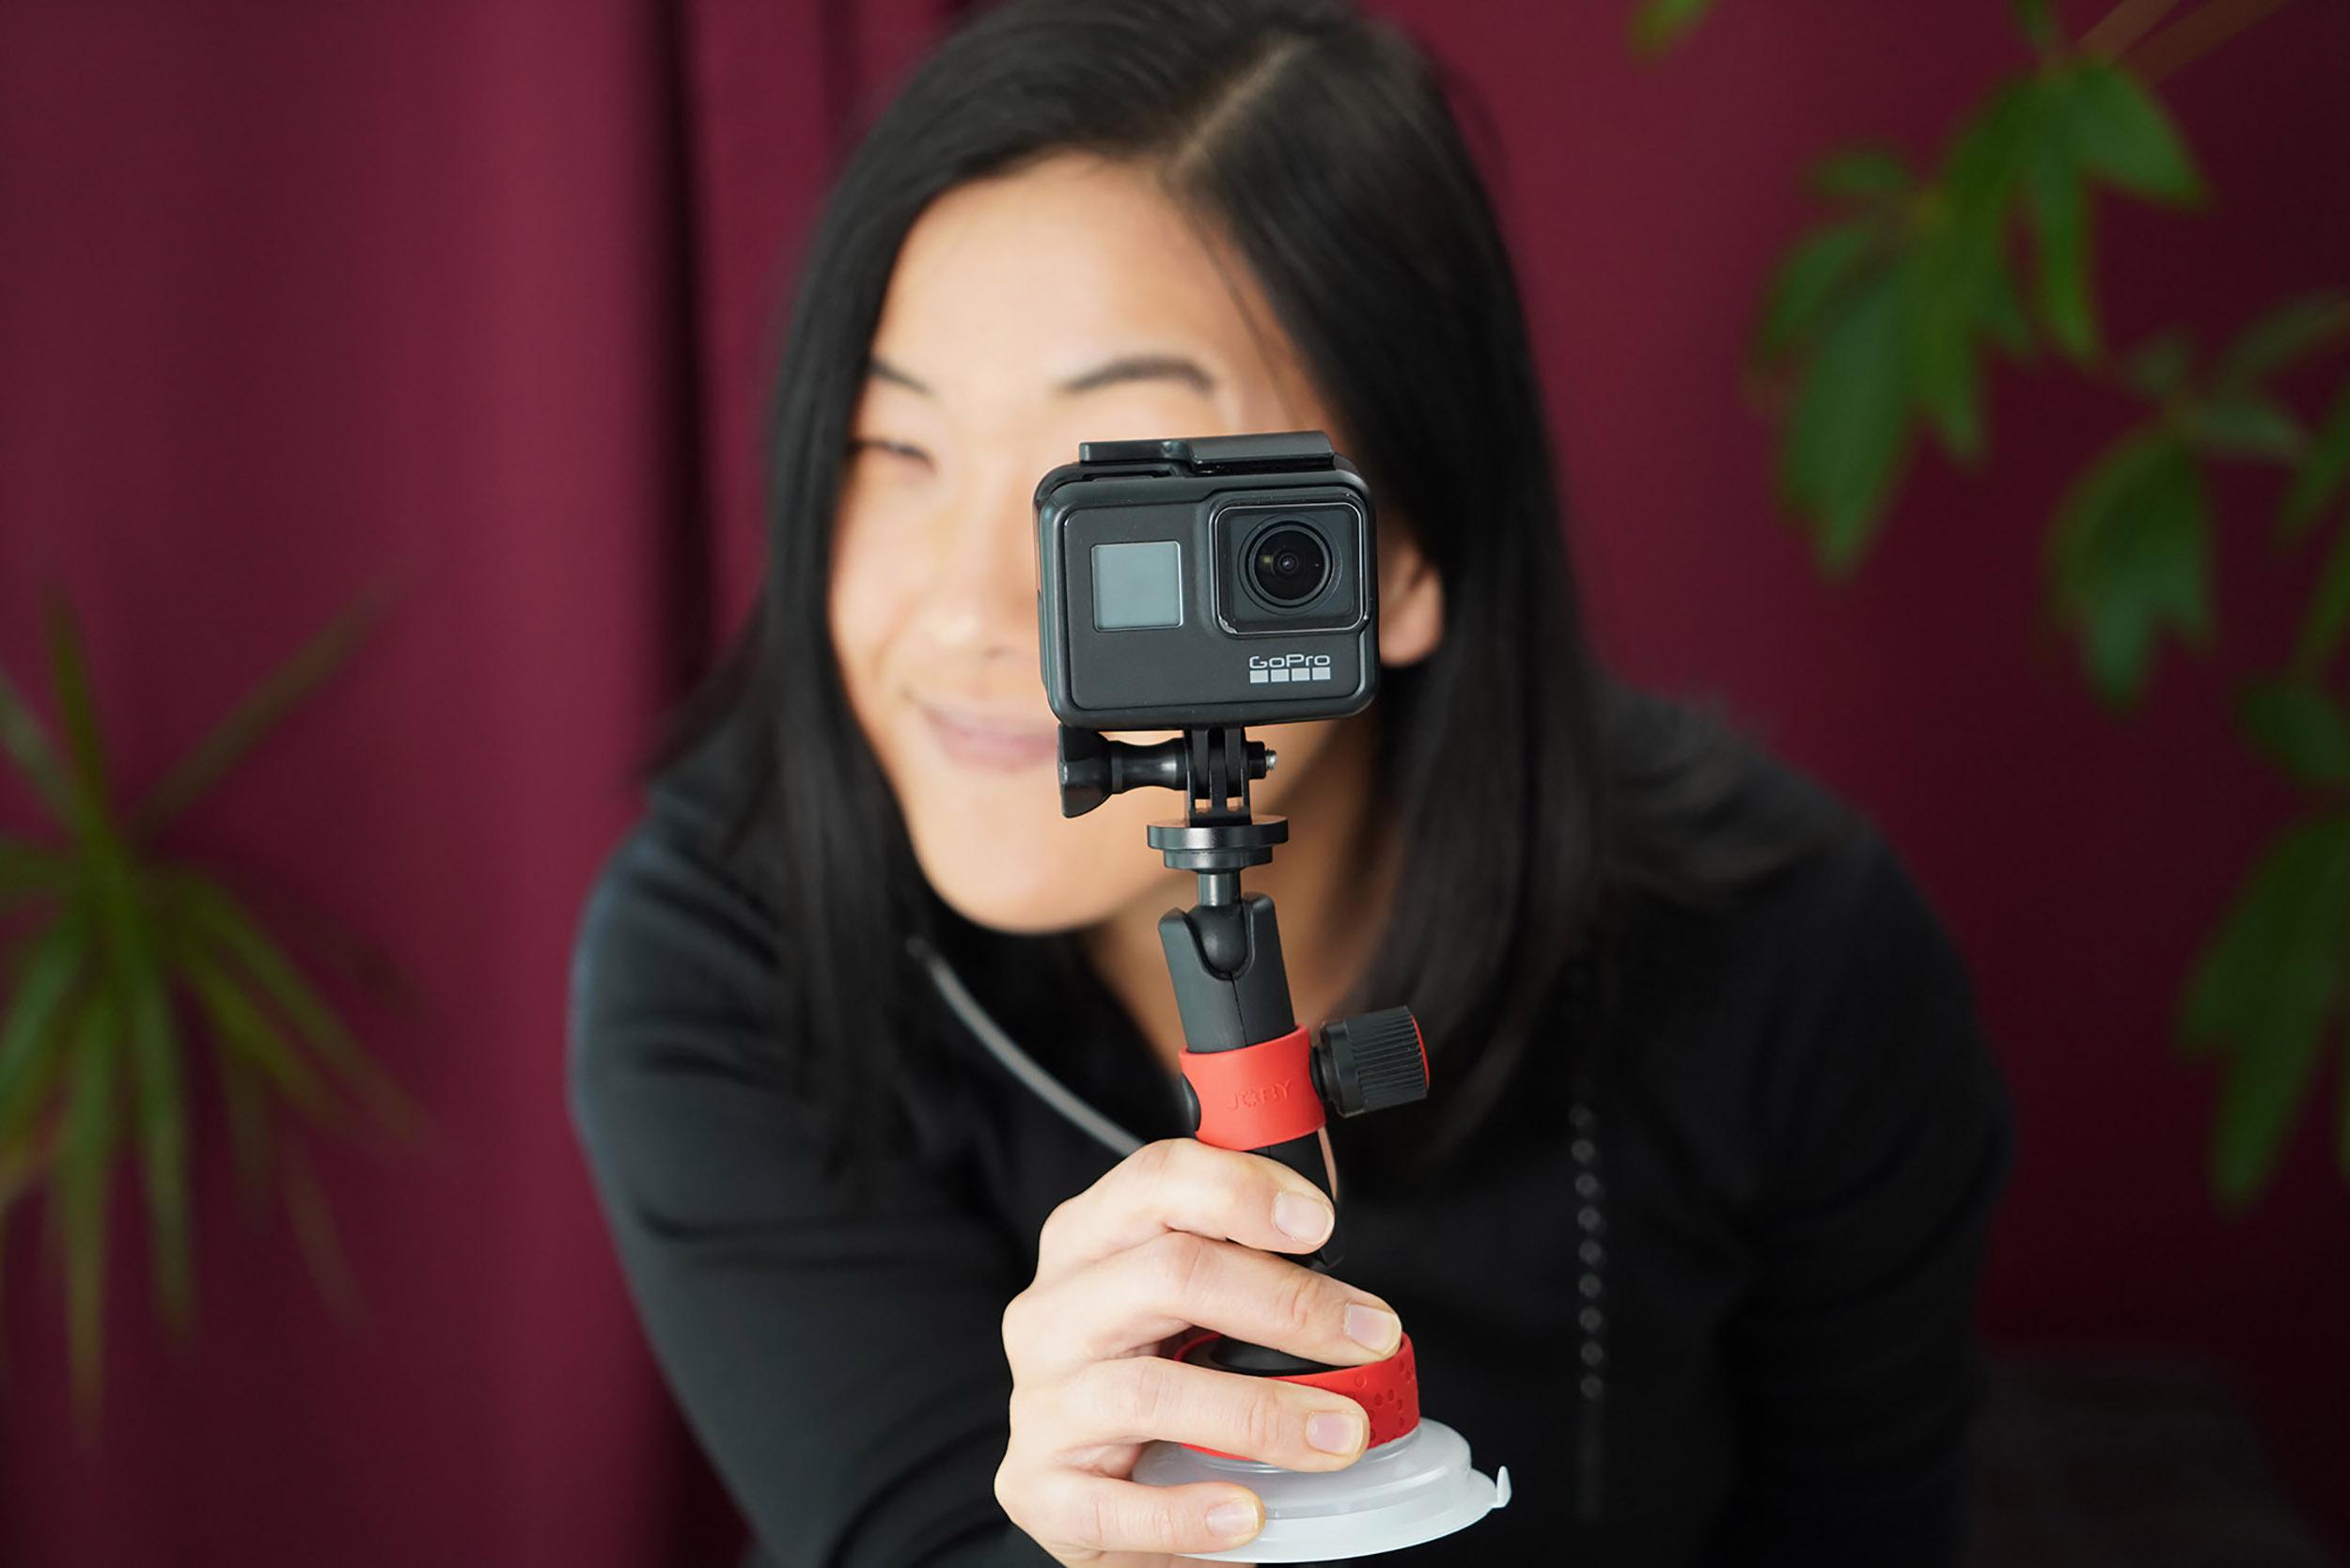 GoPro Hero 7 Black Review - 5 Things I Love and Dislike